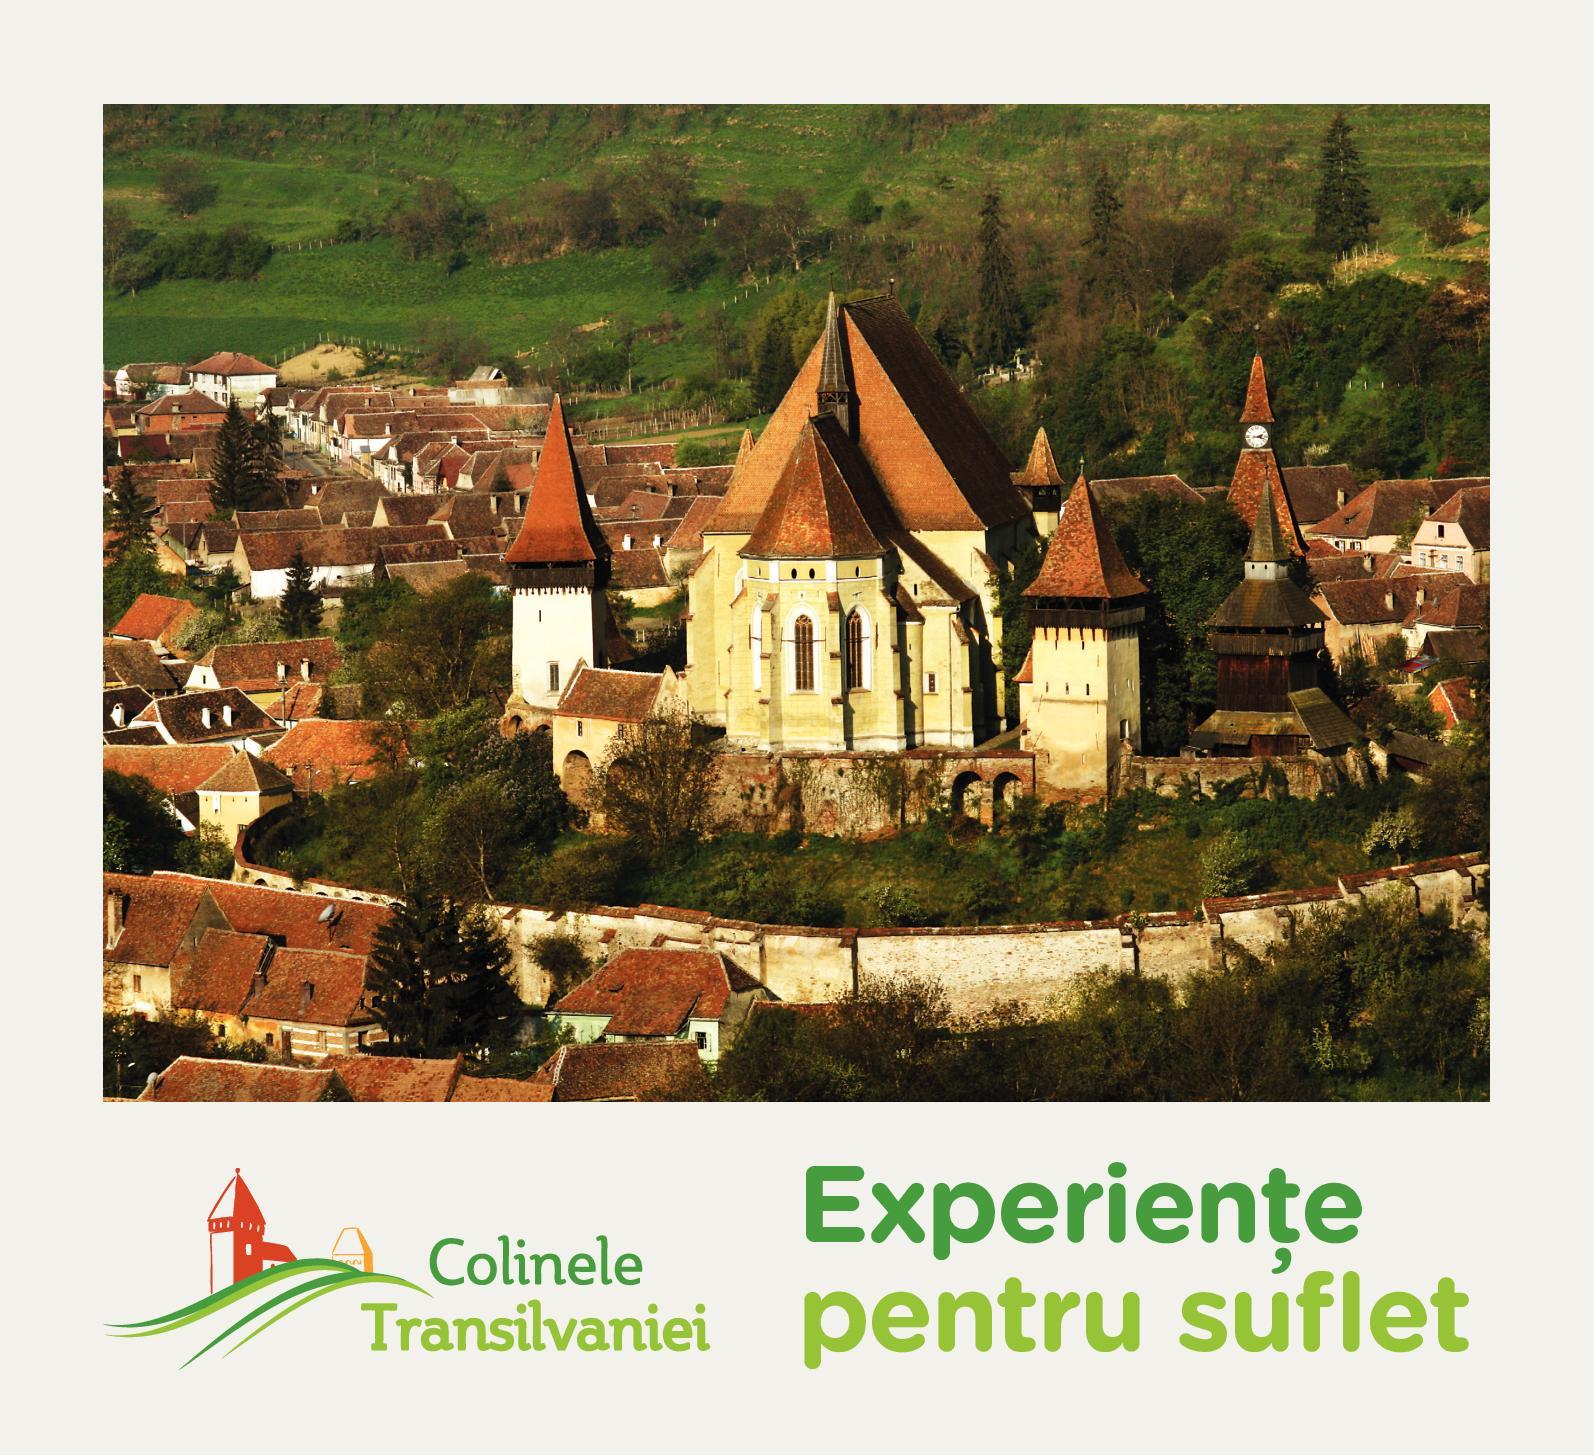 Colinele Transilvaniei RO